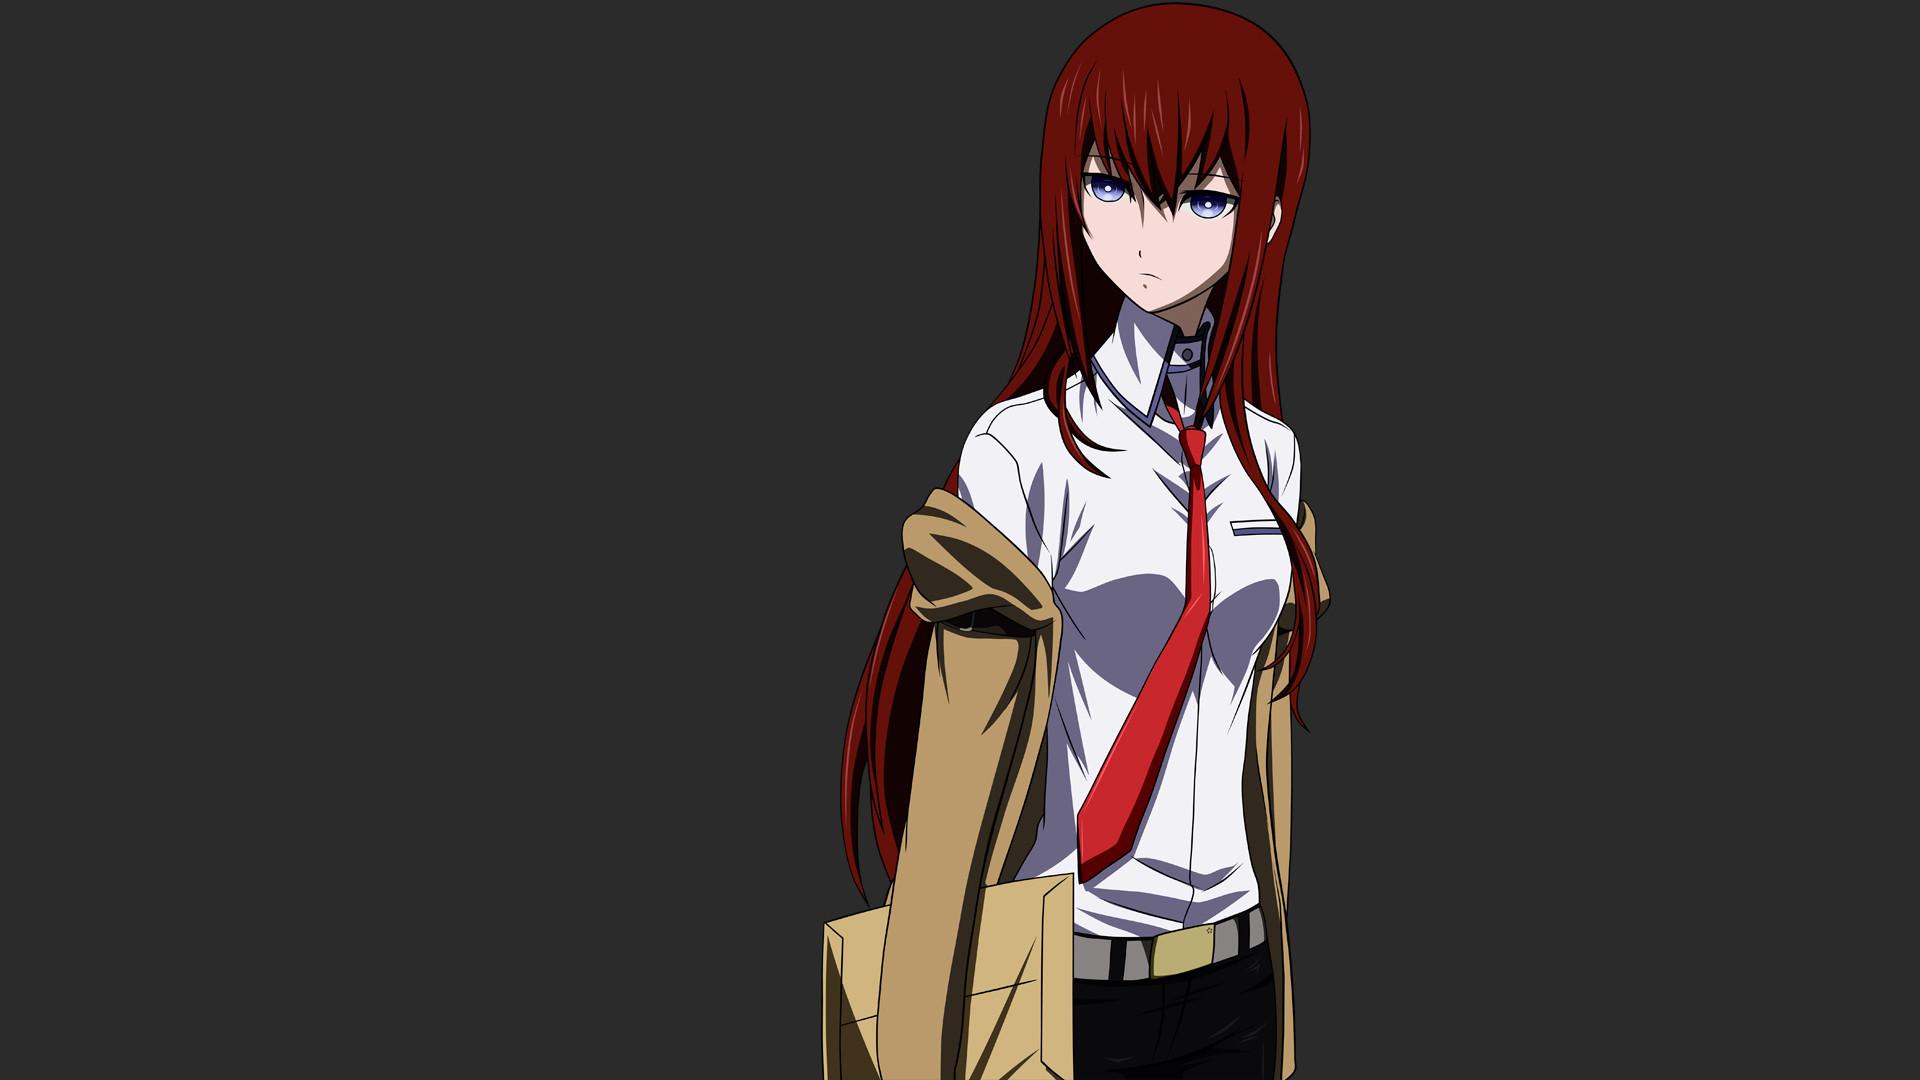 Anime Girls Makise Kurisu Simple Background SteinsGate Vectors